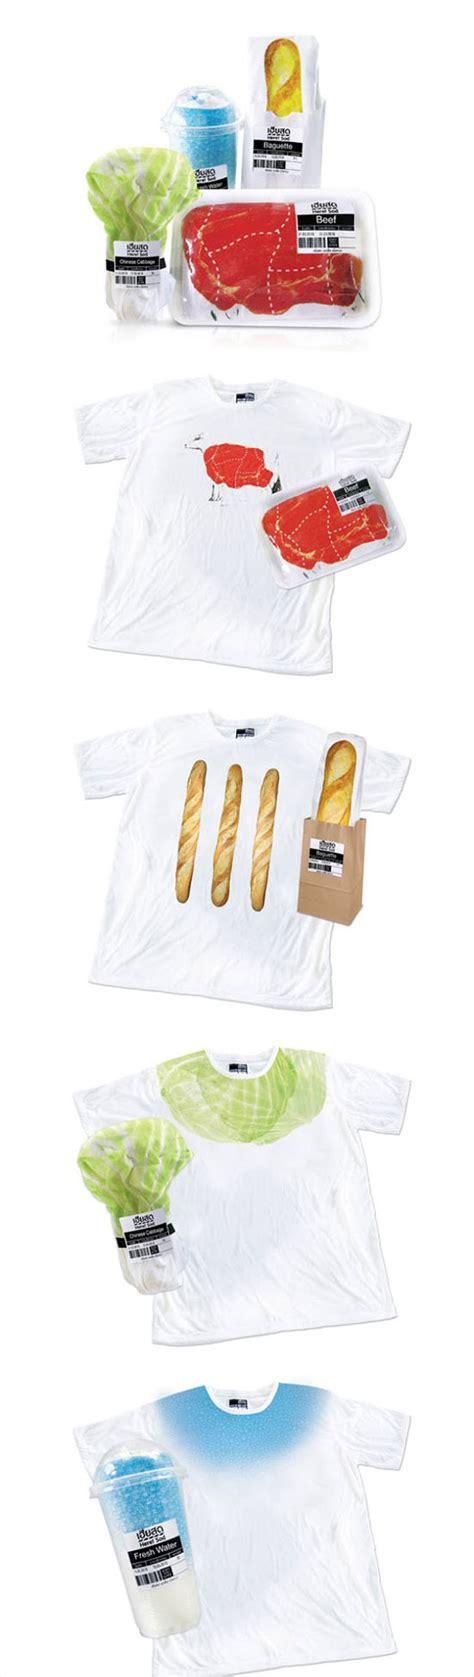 Kaos Obey 19 46 desain packaging kaos terbaik 187 casofa clothing